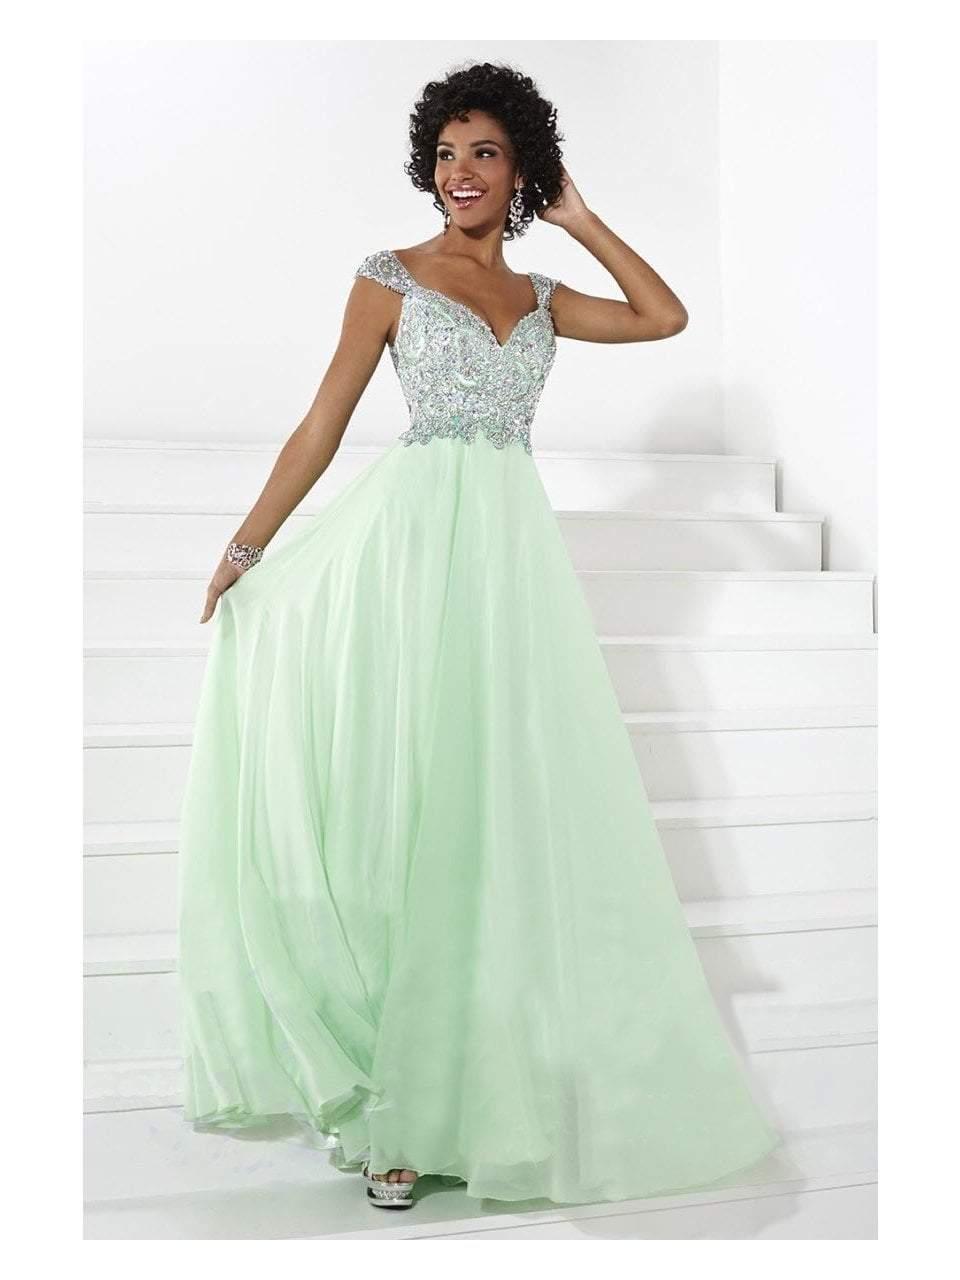 Tiffany Designs - 16085 Elegant Embellished V-neck Silky Chiffon A-line Dress